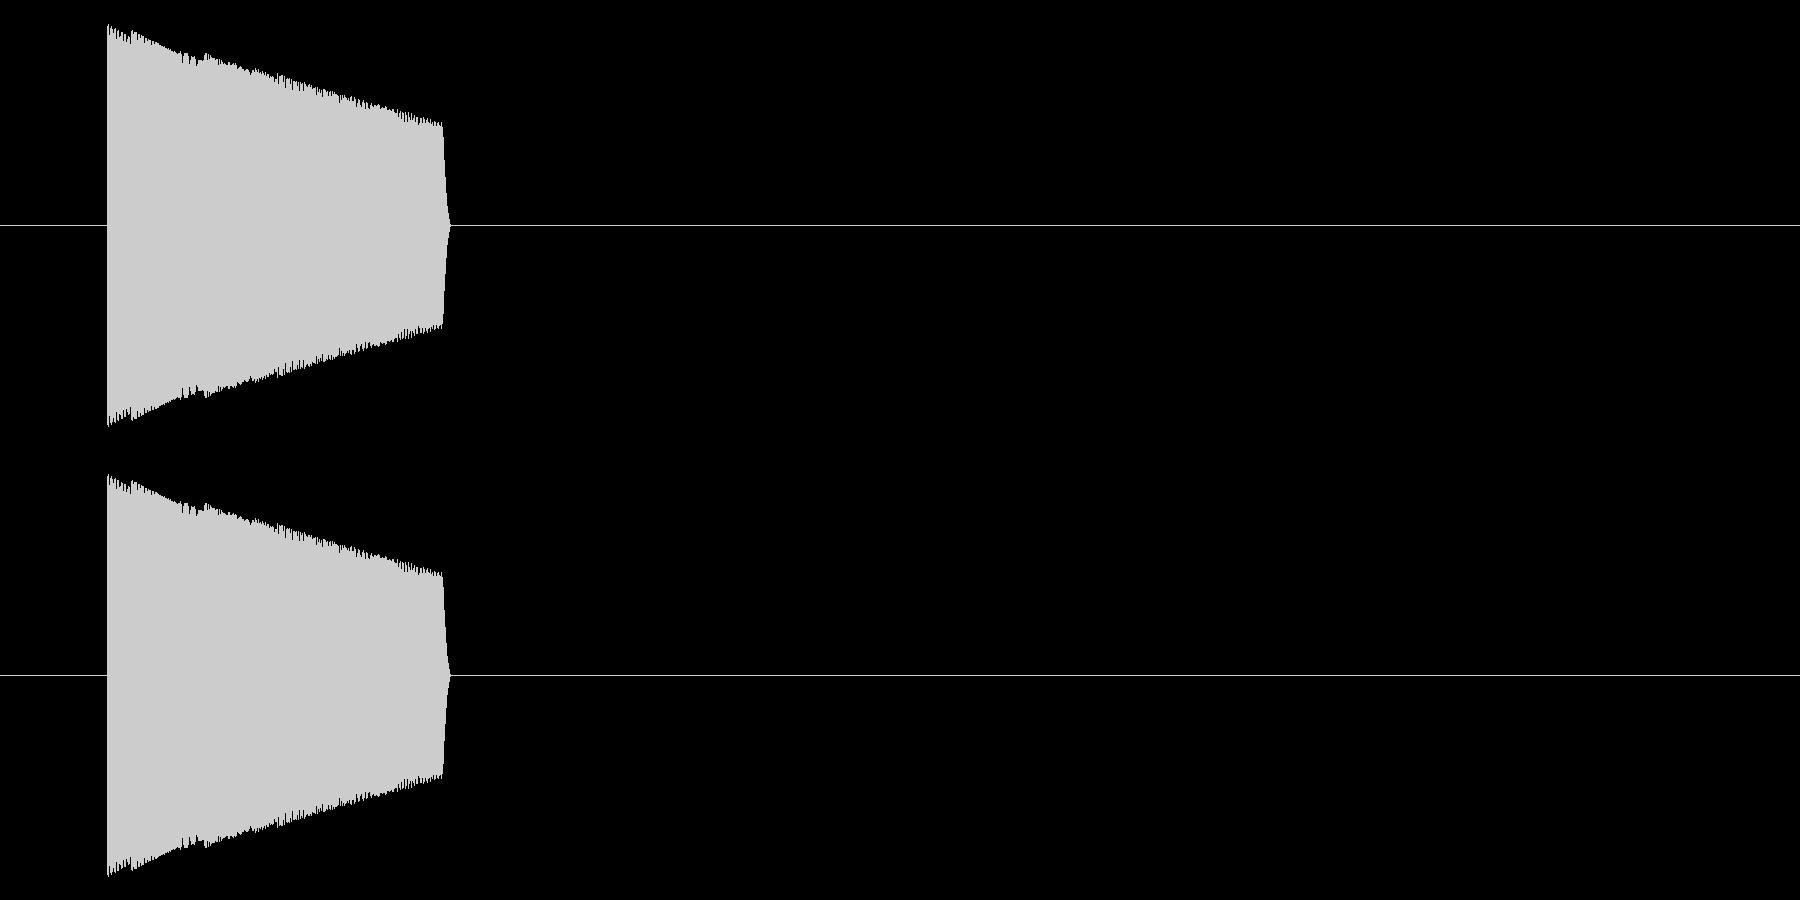 【GB 汎用02-08(ピッチ)】 の未再生の波形